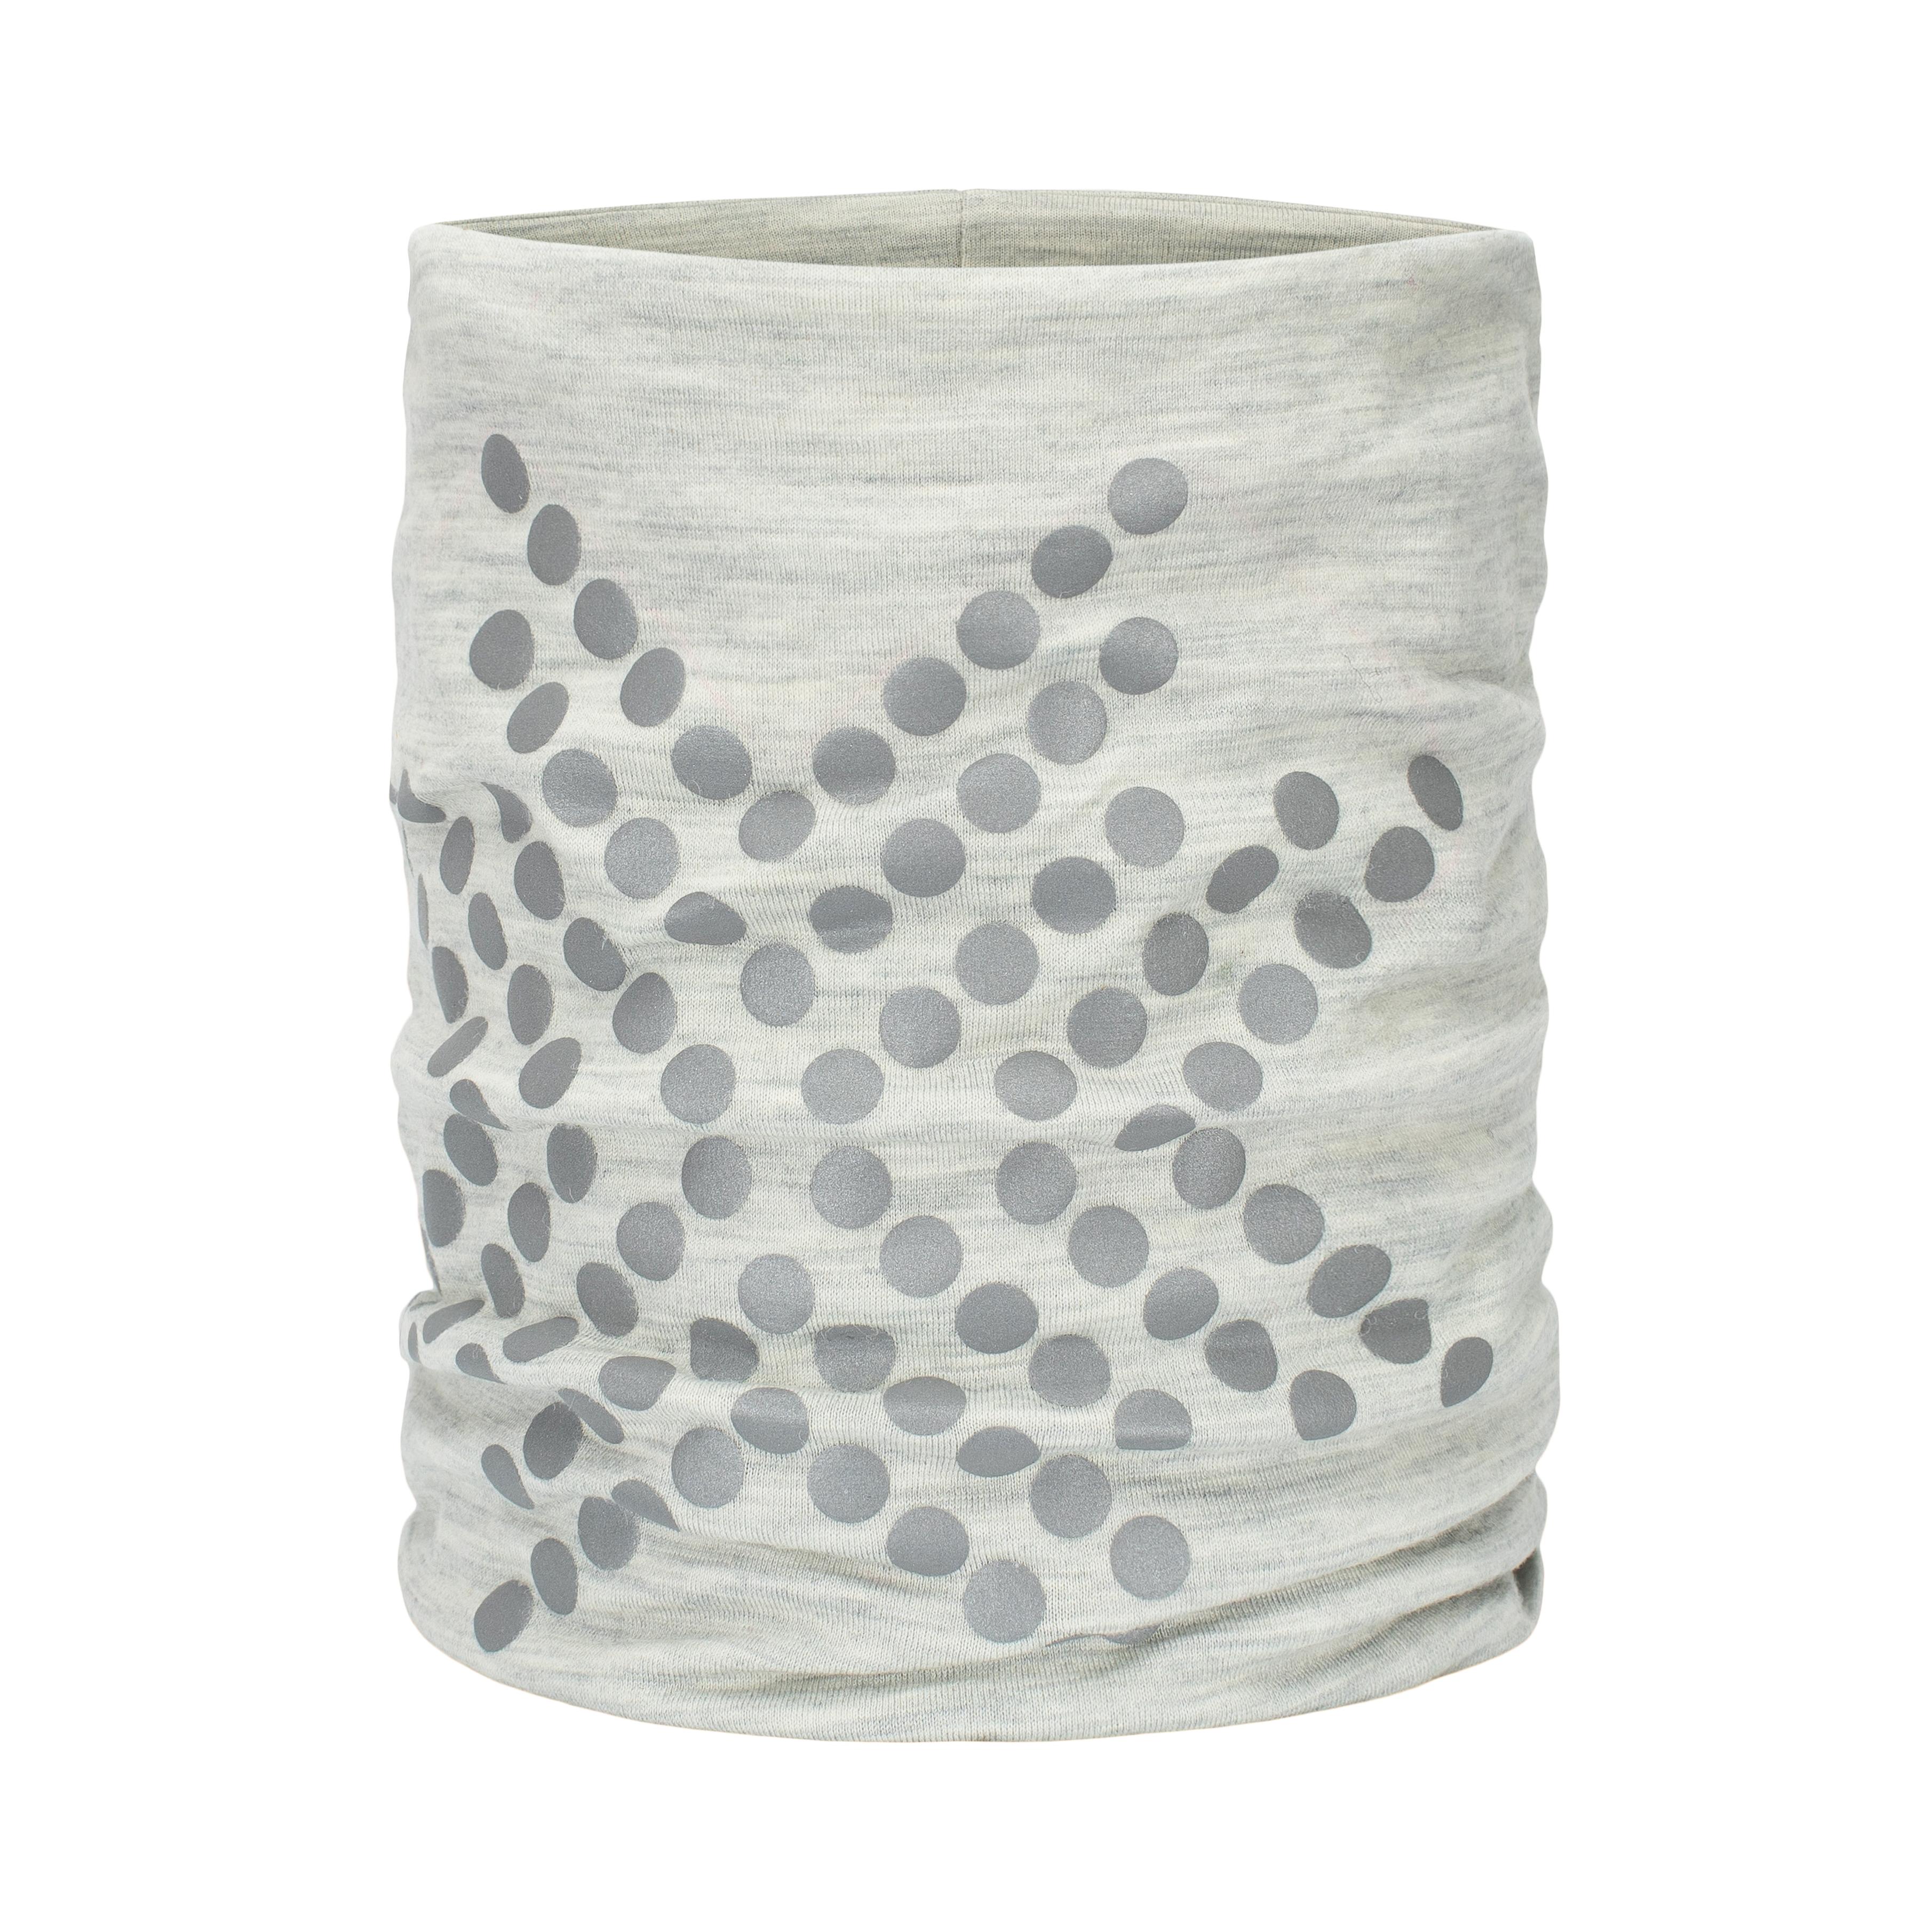 Morild Sølvfaks hals med refleks, lysegrå